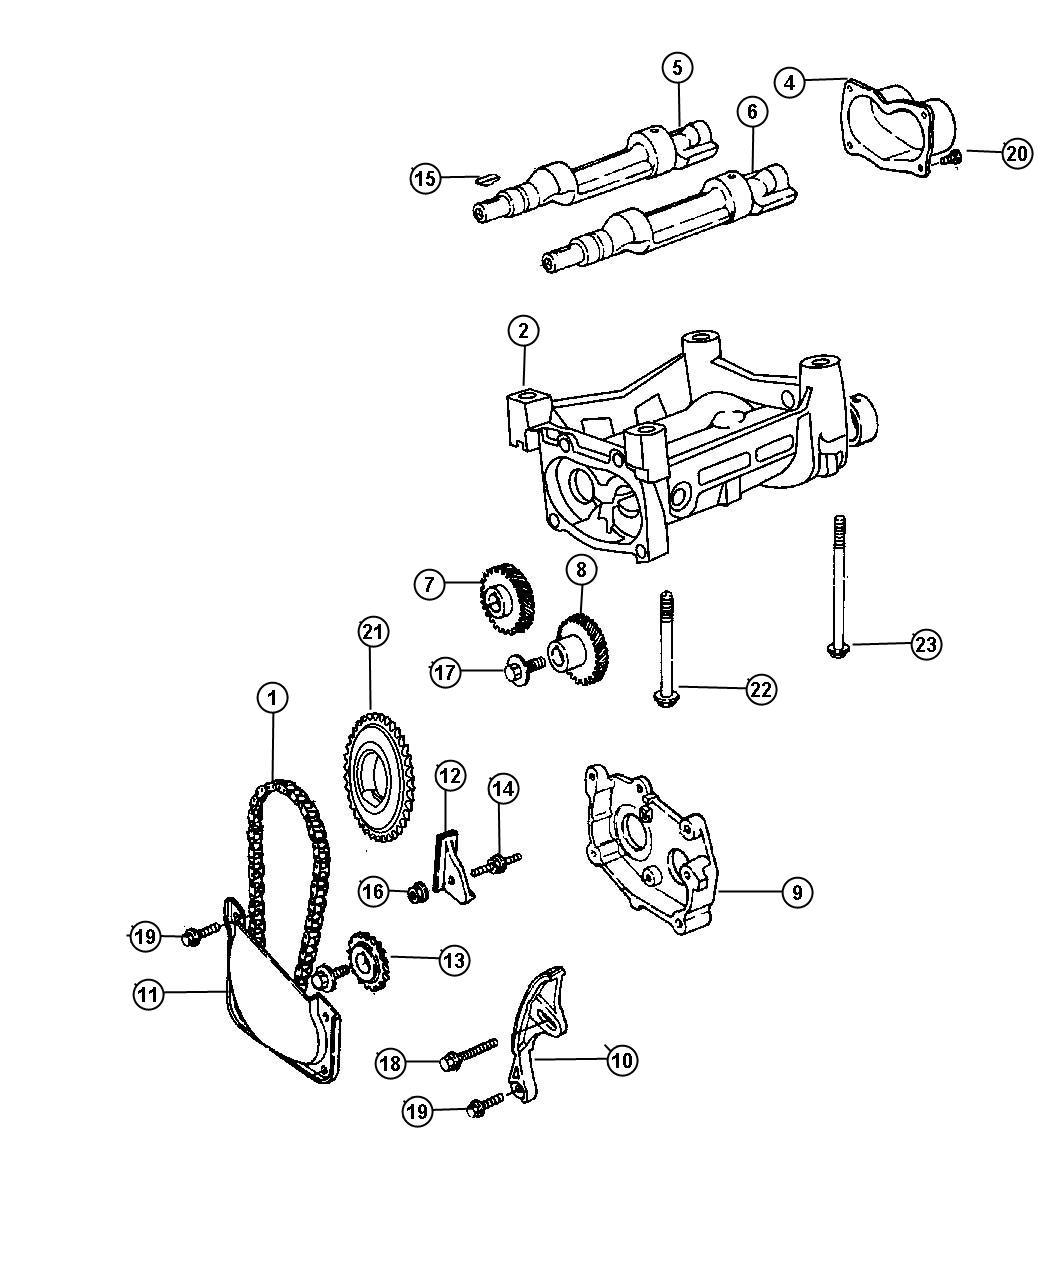 Dodge Stratus Sxt Balance Shafts 2 4l I4 Dohc 16v